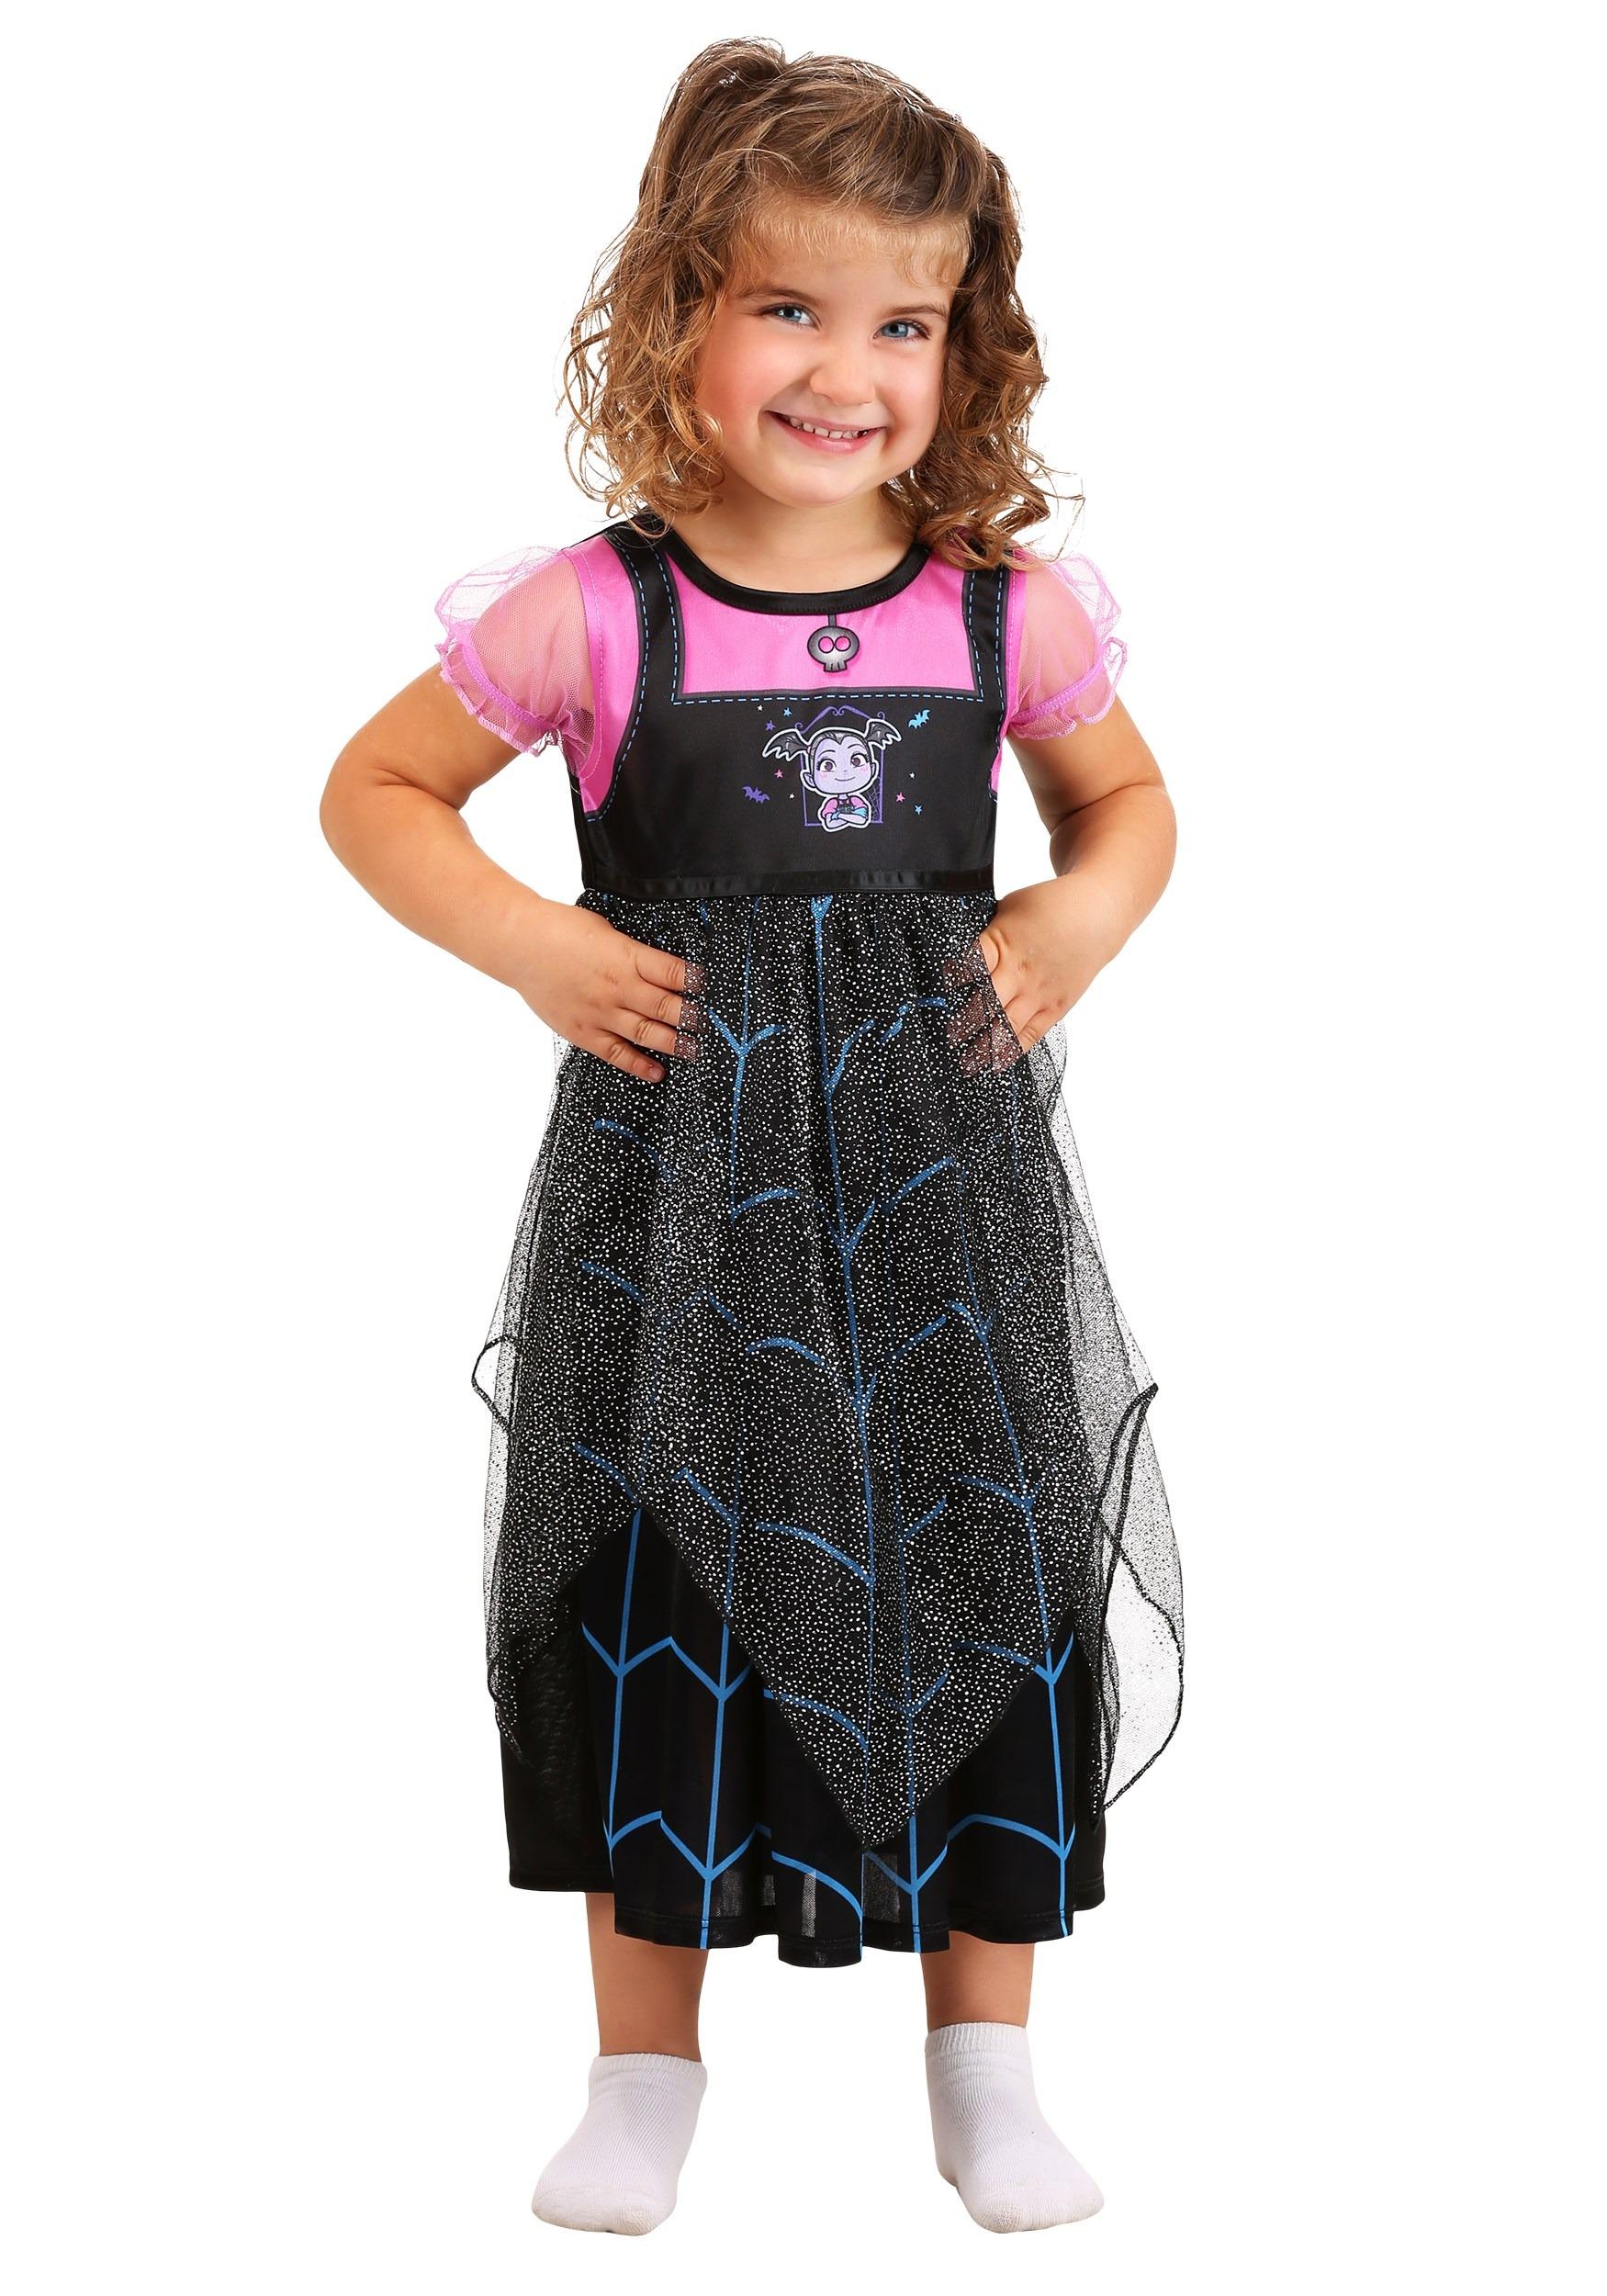 Vampirina Toddler Fantasy Nightgown for Girls